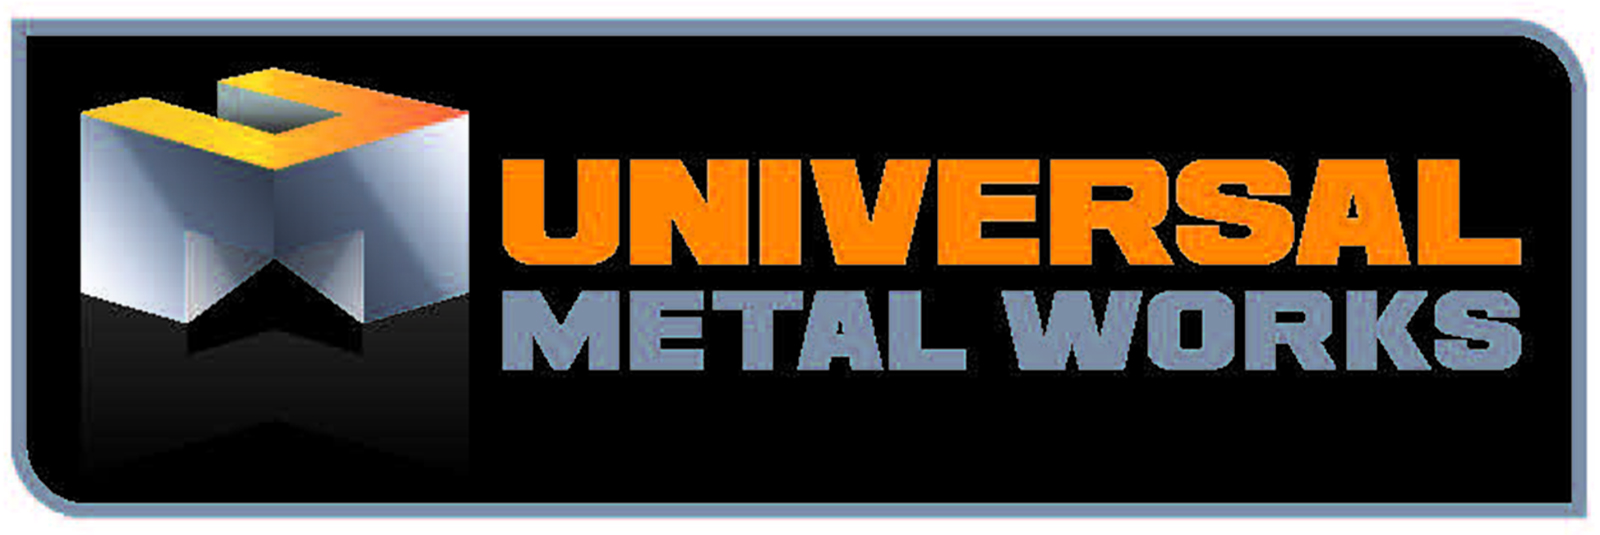 Universal Metal Works, LLC